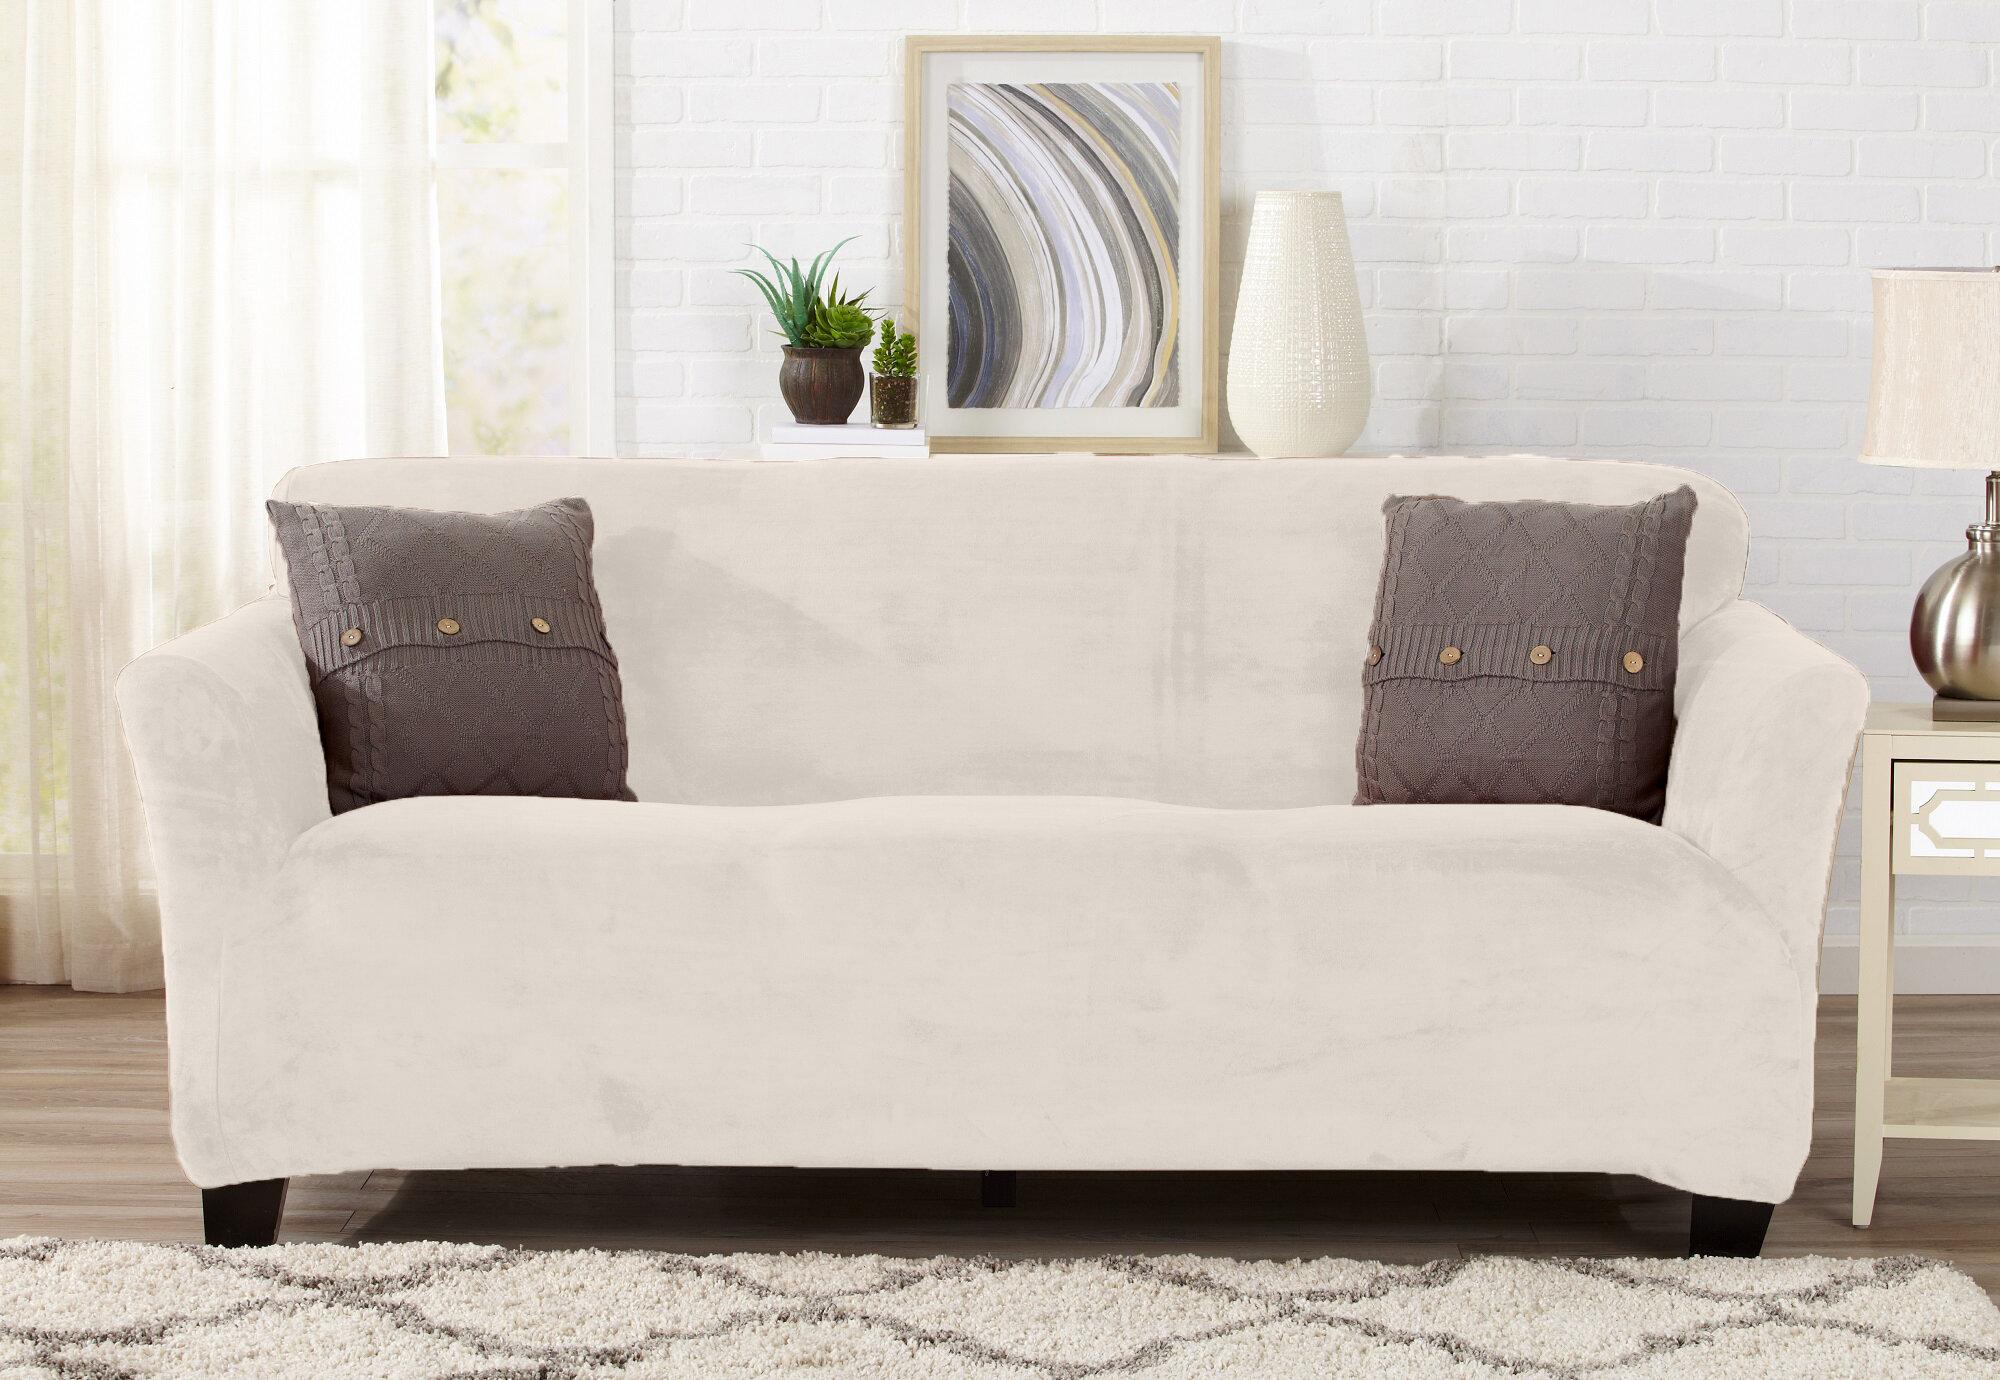 Symple Stuff Velvet Plush Form Fit T Cushion Sofa Slipcover